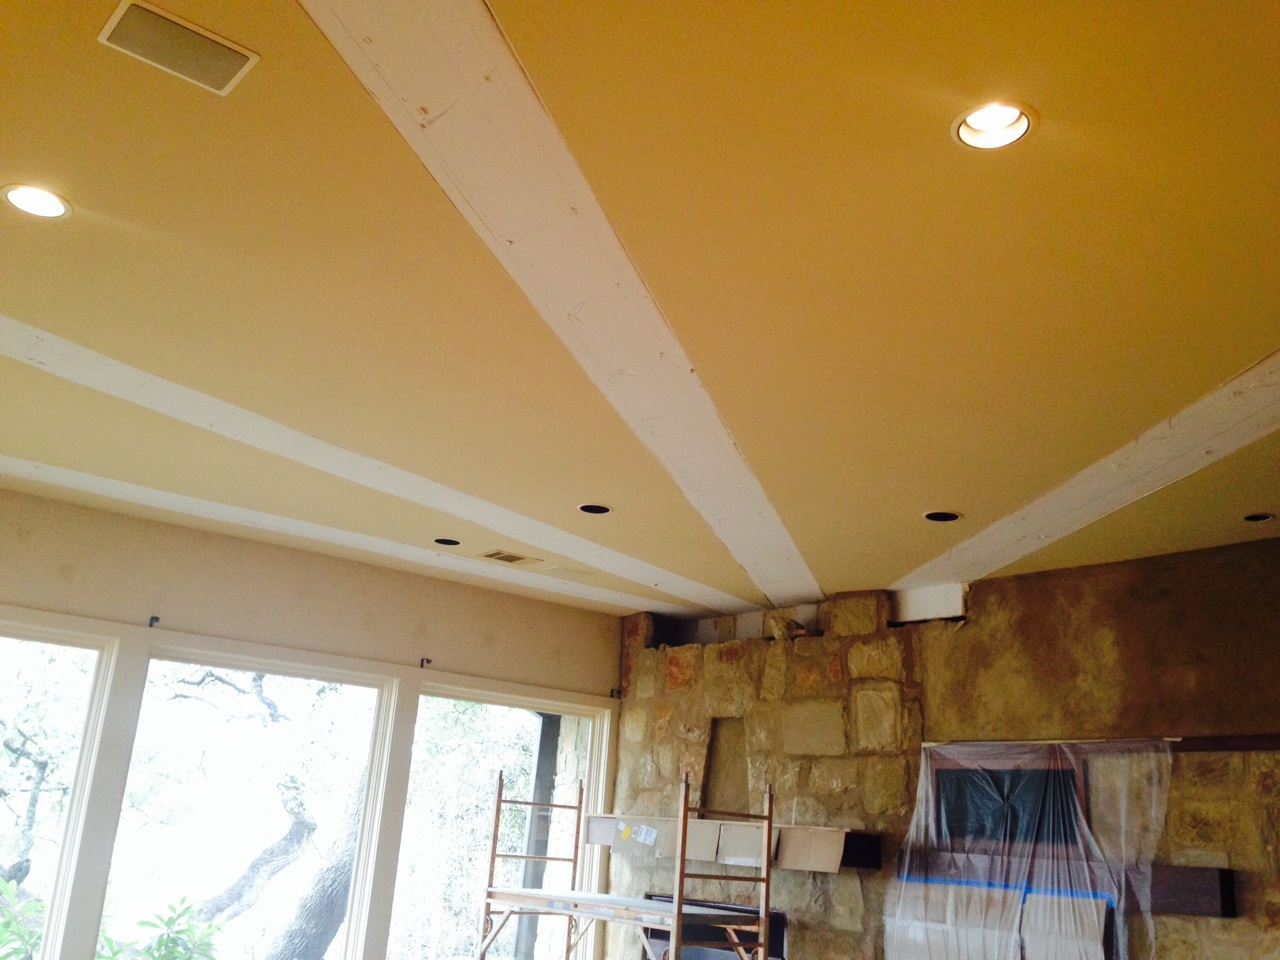 austin_interior_design_renovation013.JPG